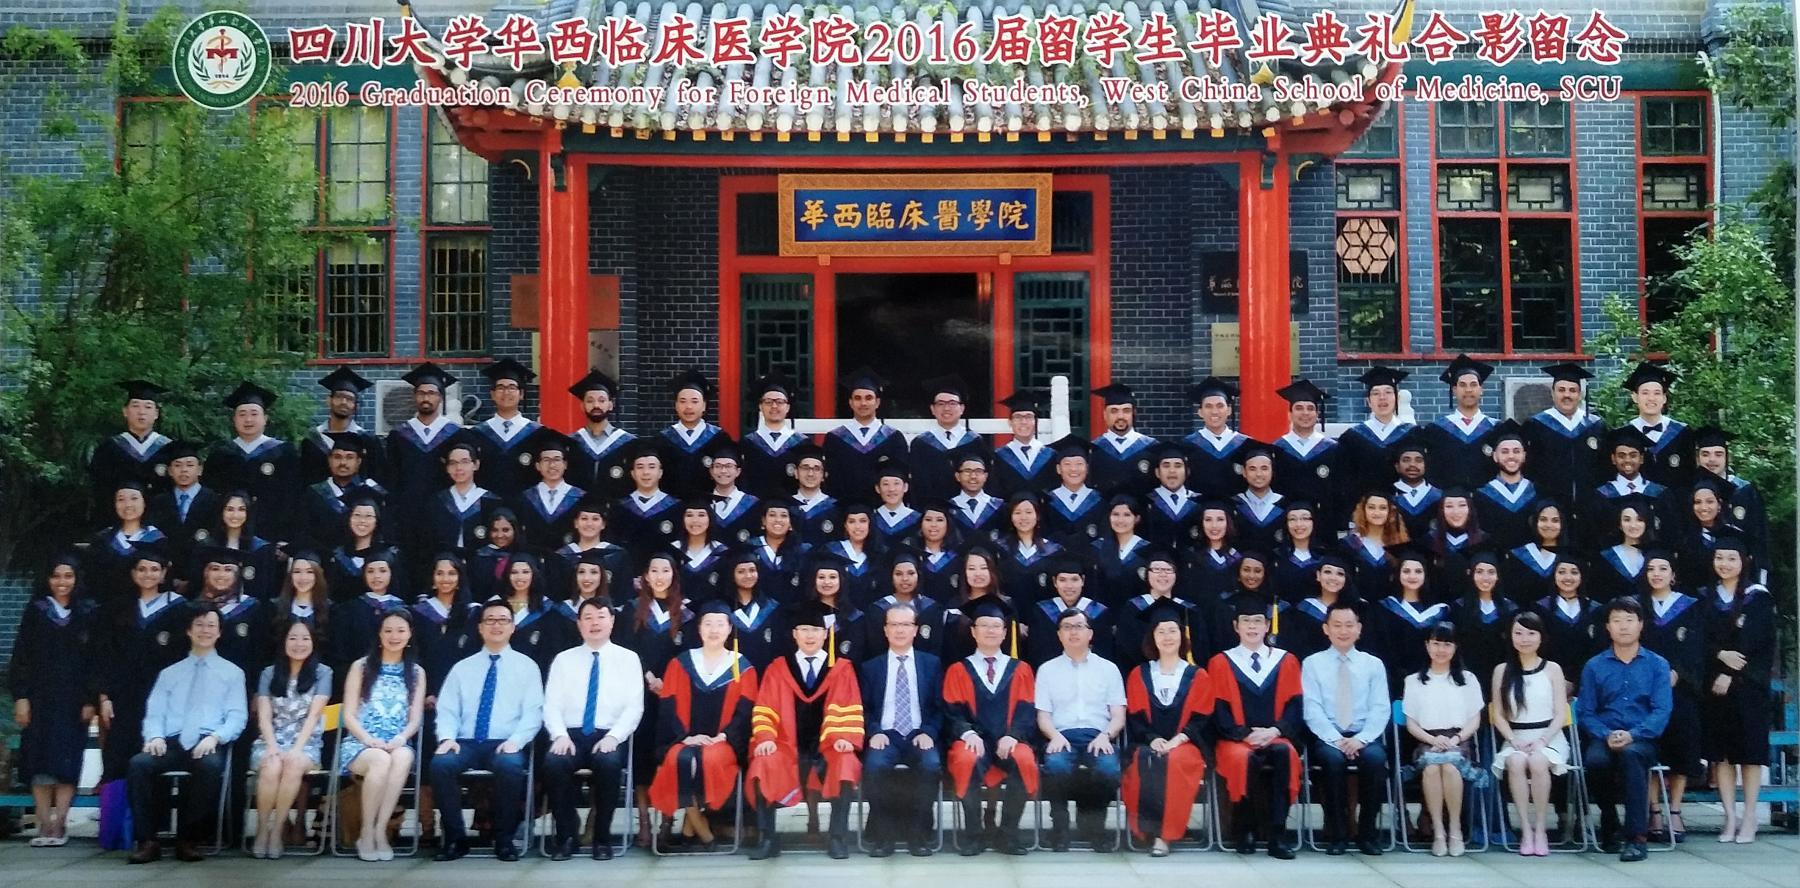 Graduation ceremony of Batch 2010